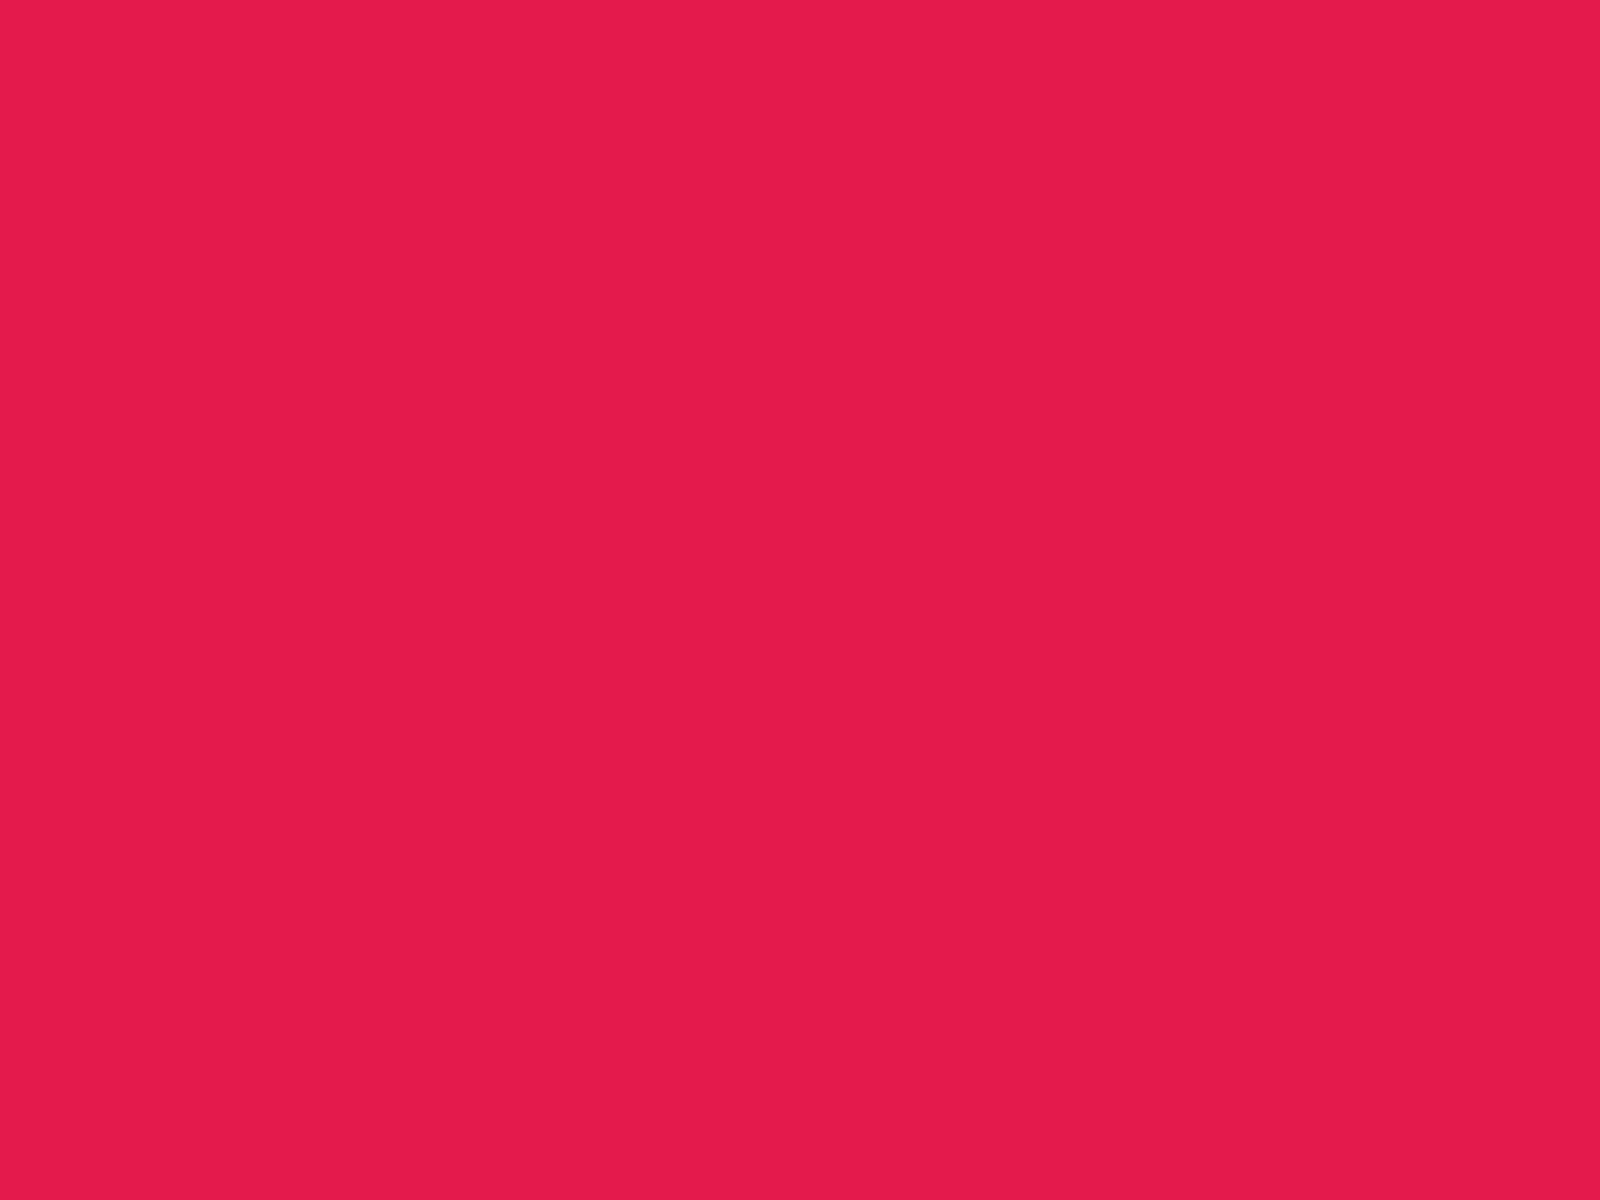 1600x1200 Spanish Crimson Solid Color Background